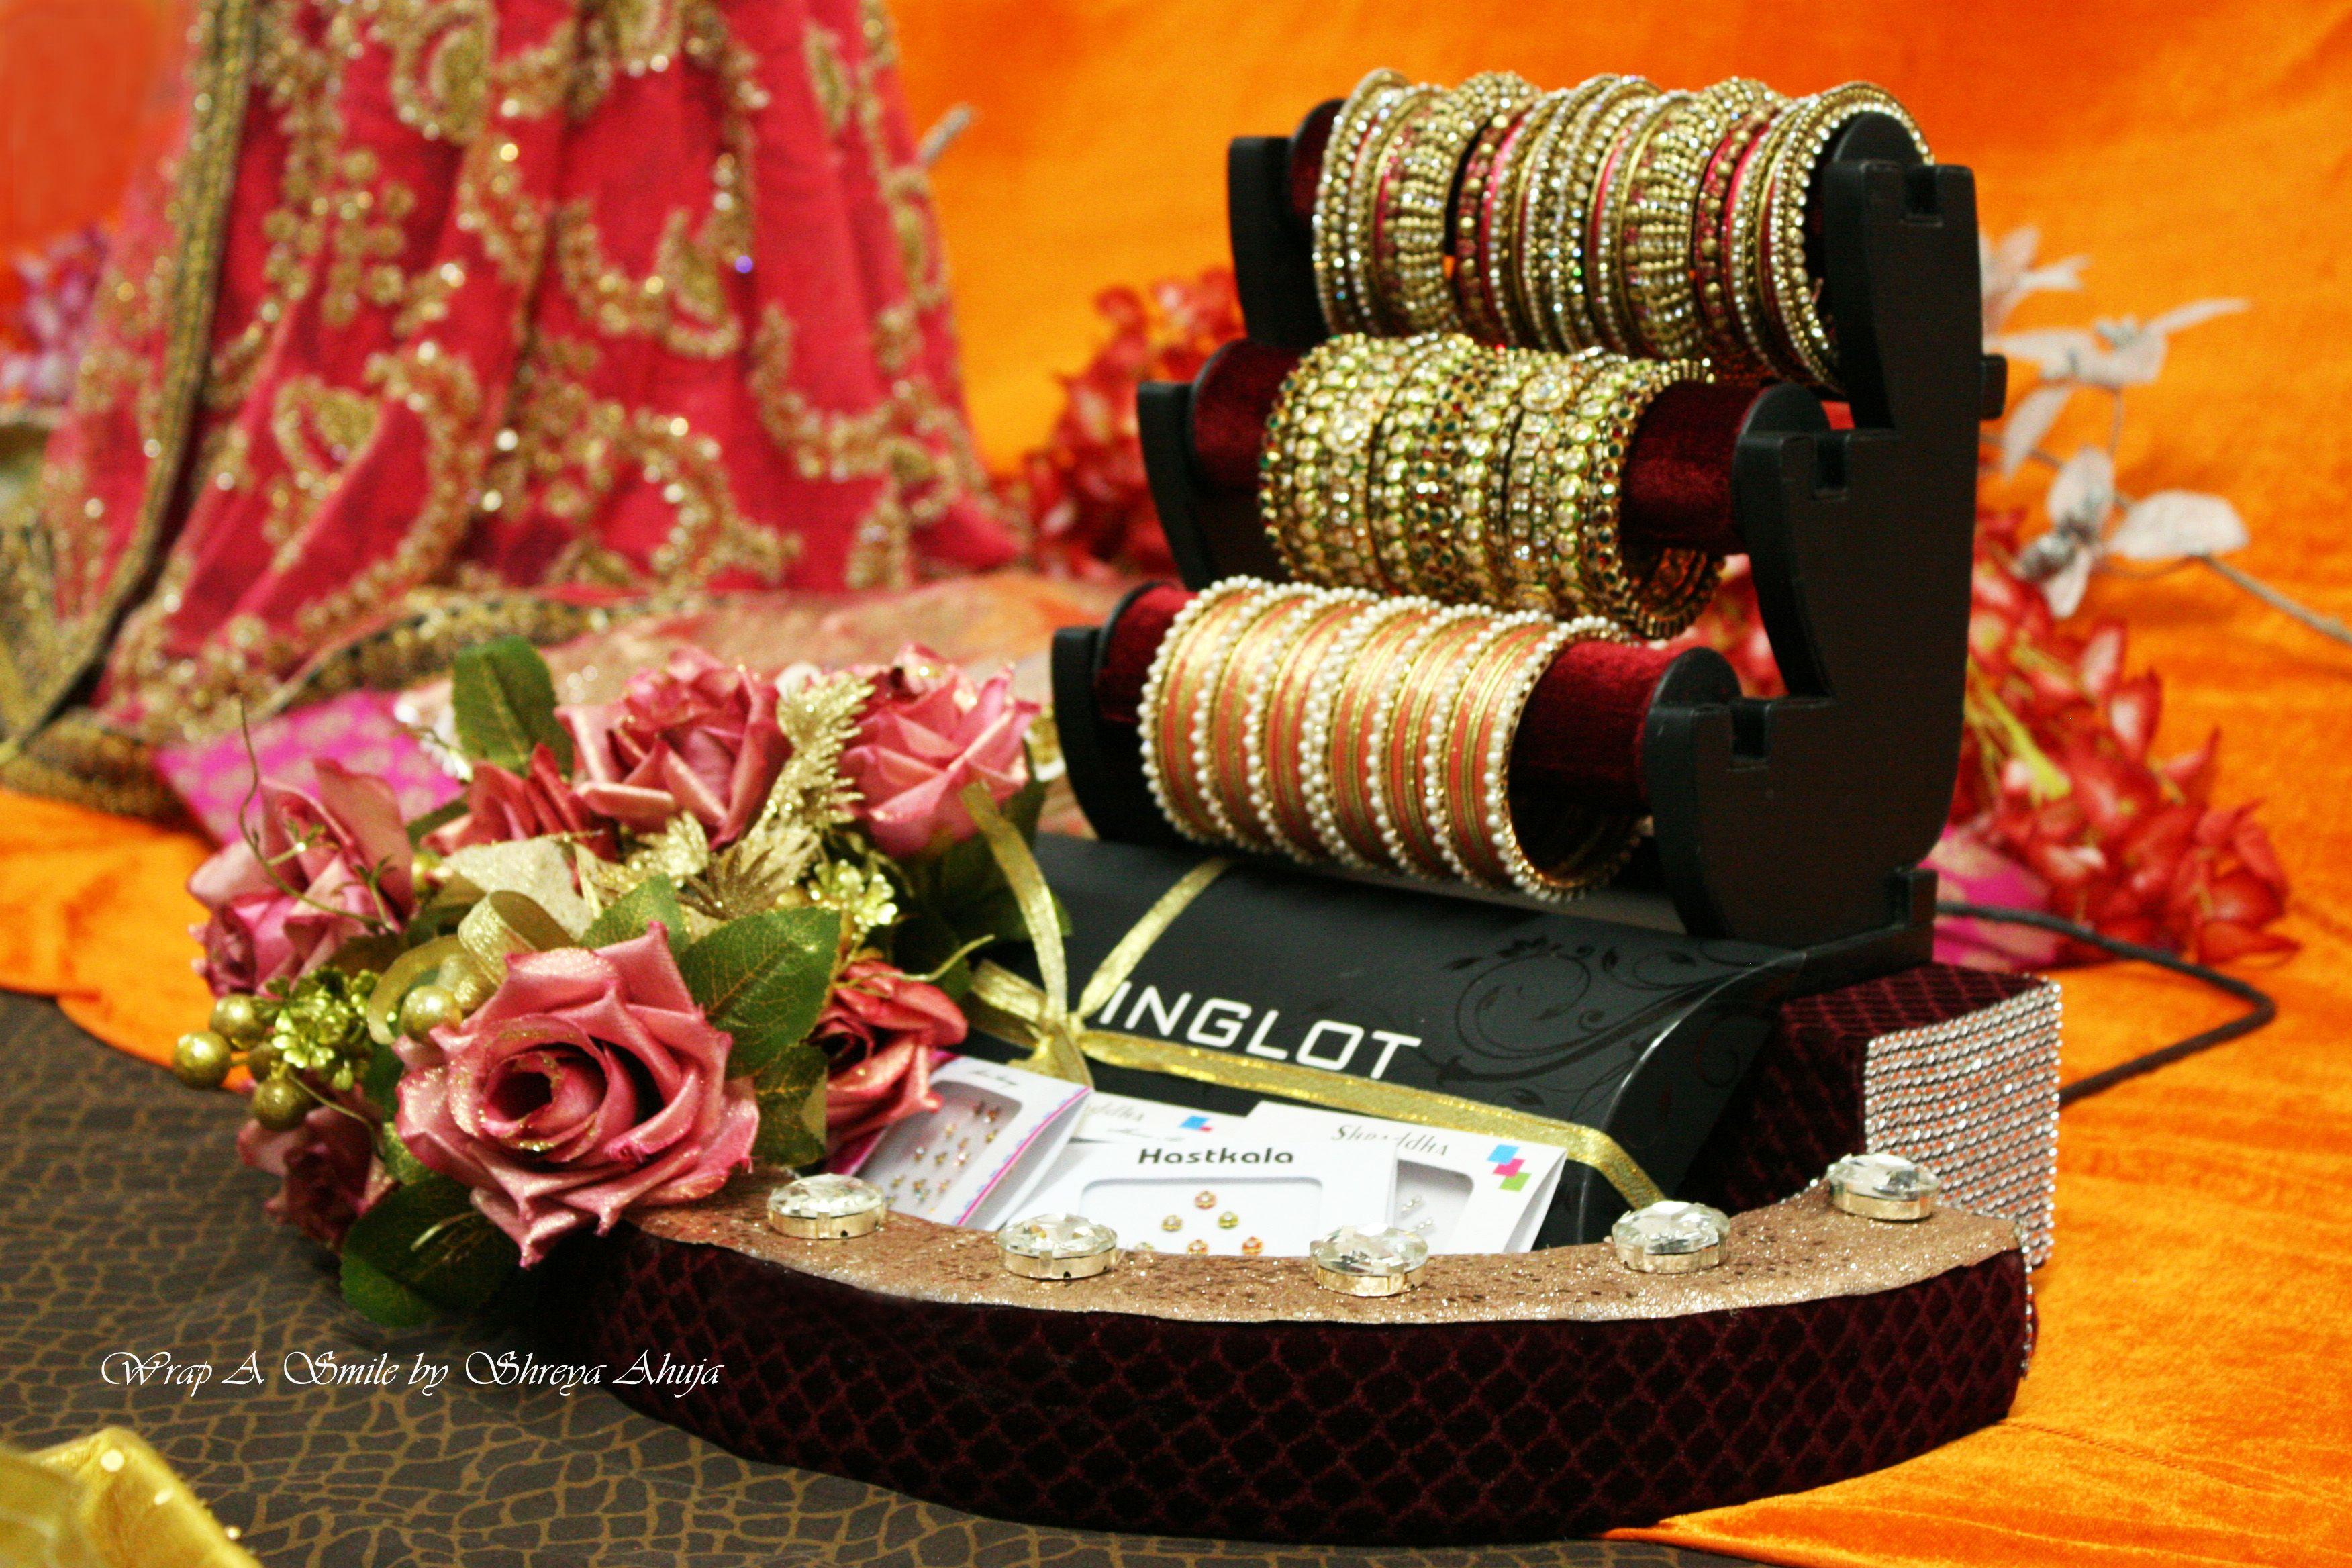 Trousseau Ng Wrap A Smile Gift Packagingindian Weddingsindian Wedding